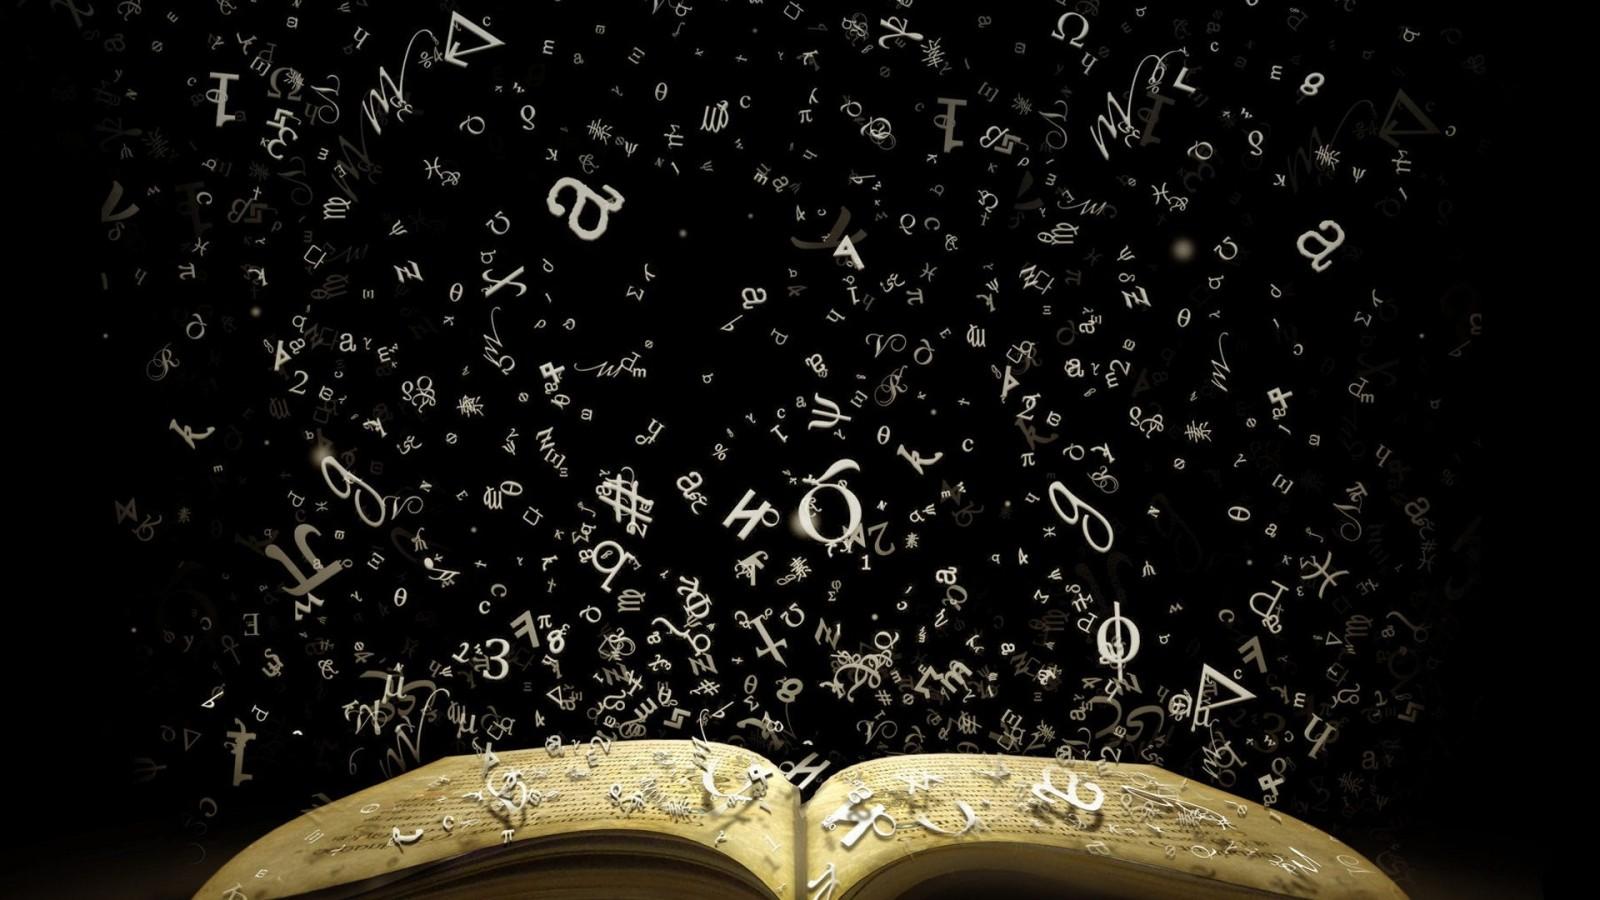 books_literature_numbers_signs_knowledge_black_background_Greek-170435.jpg!d.jpeg